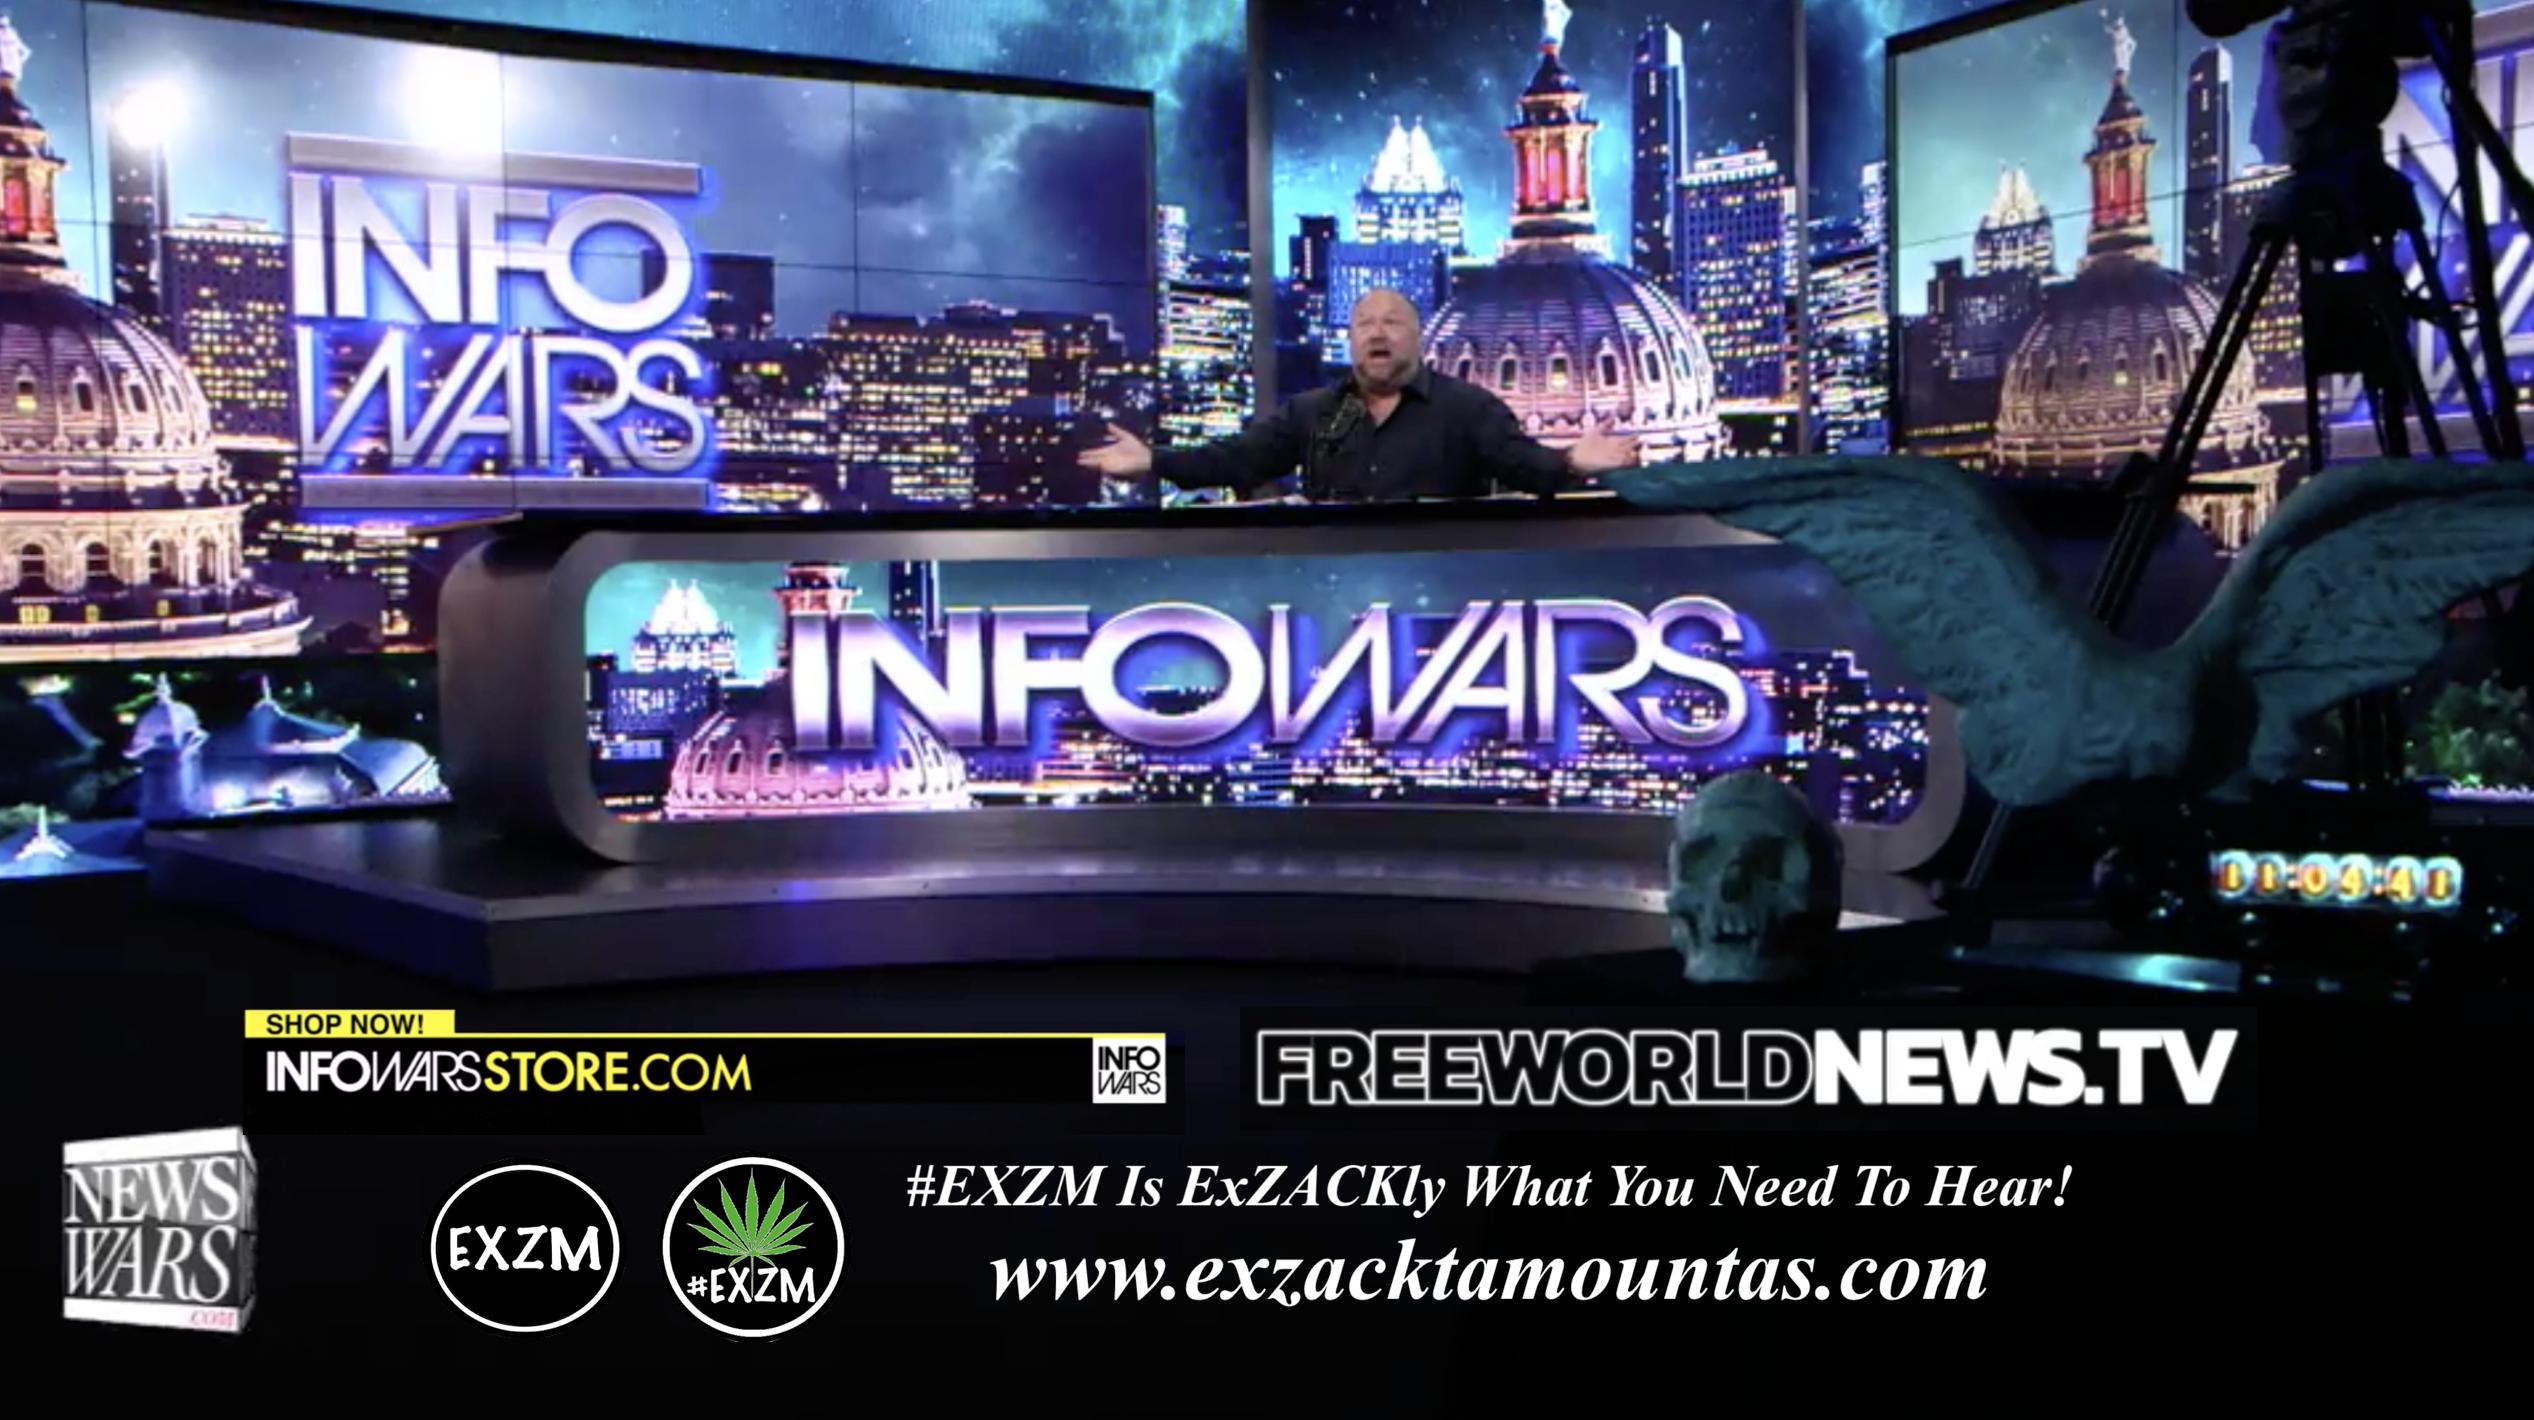 Alex Jones Live In Infowars Studio Free World News TV EXZM Zack Mount August 6th 2021 copy